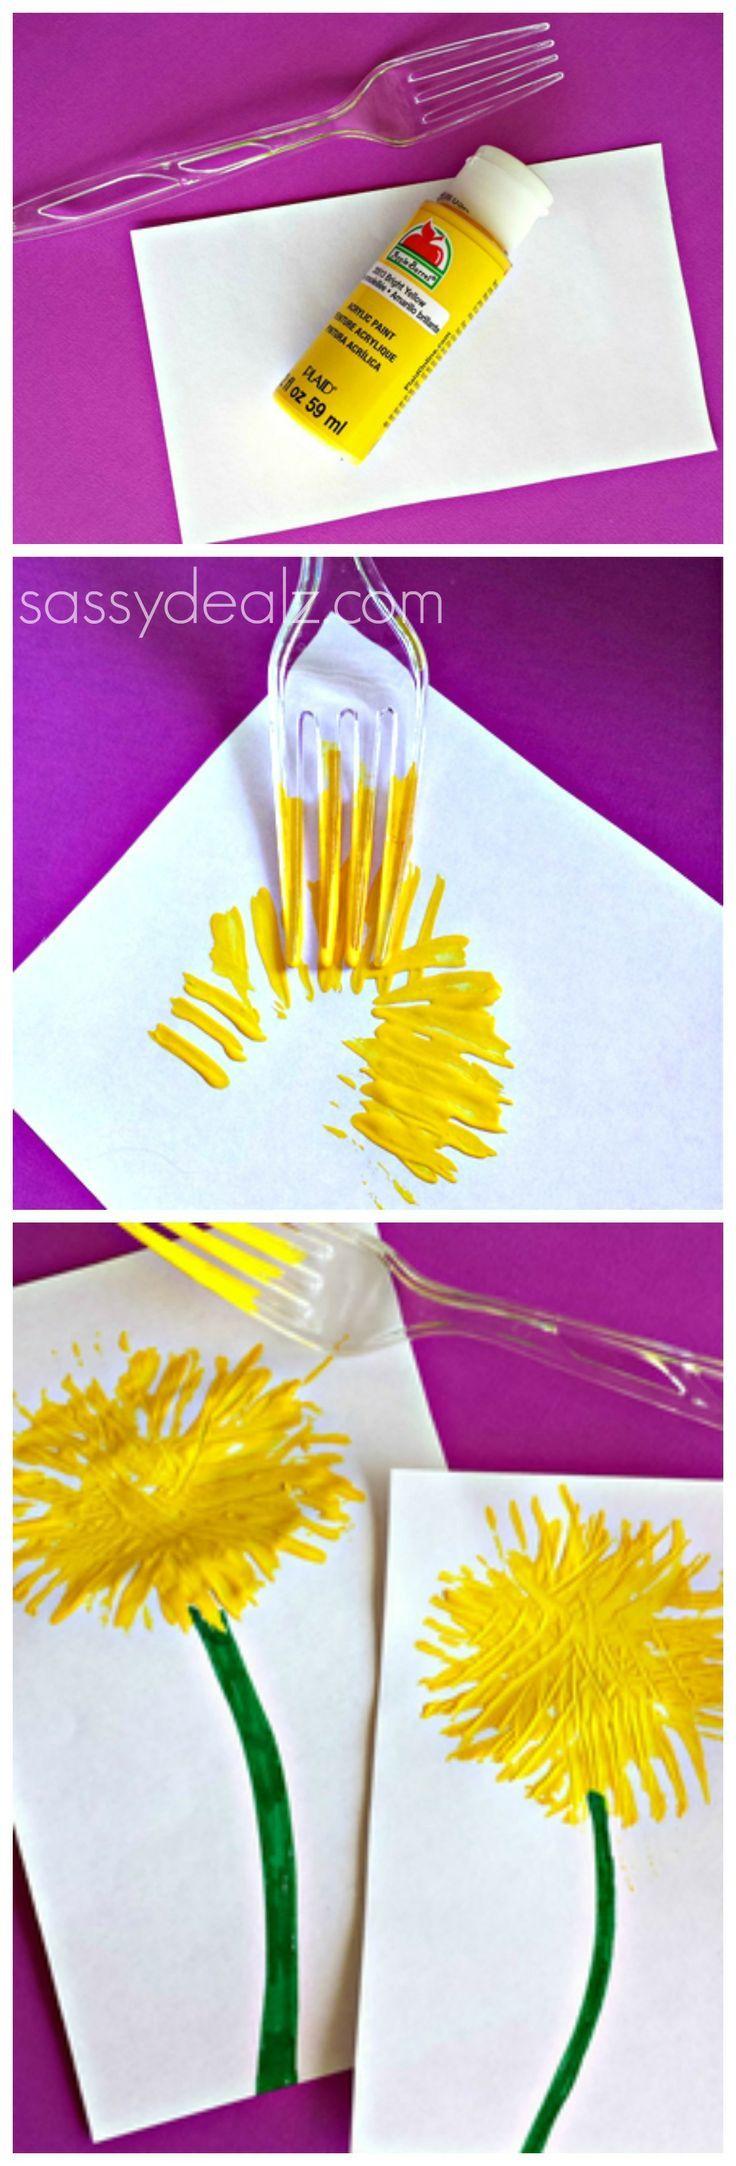 Make a Dandelion Craft using a Fork! #Spring craft for kids #Easy | CraftyMorning.com